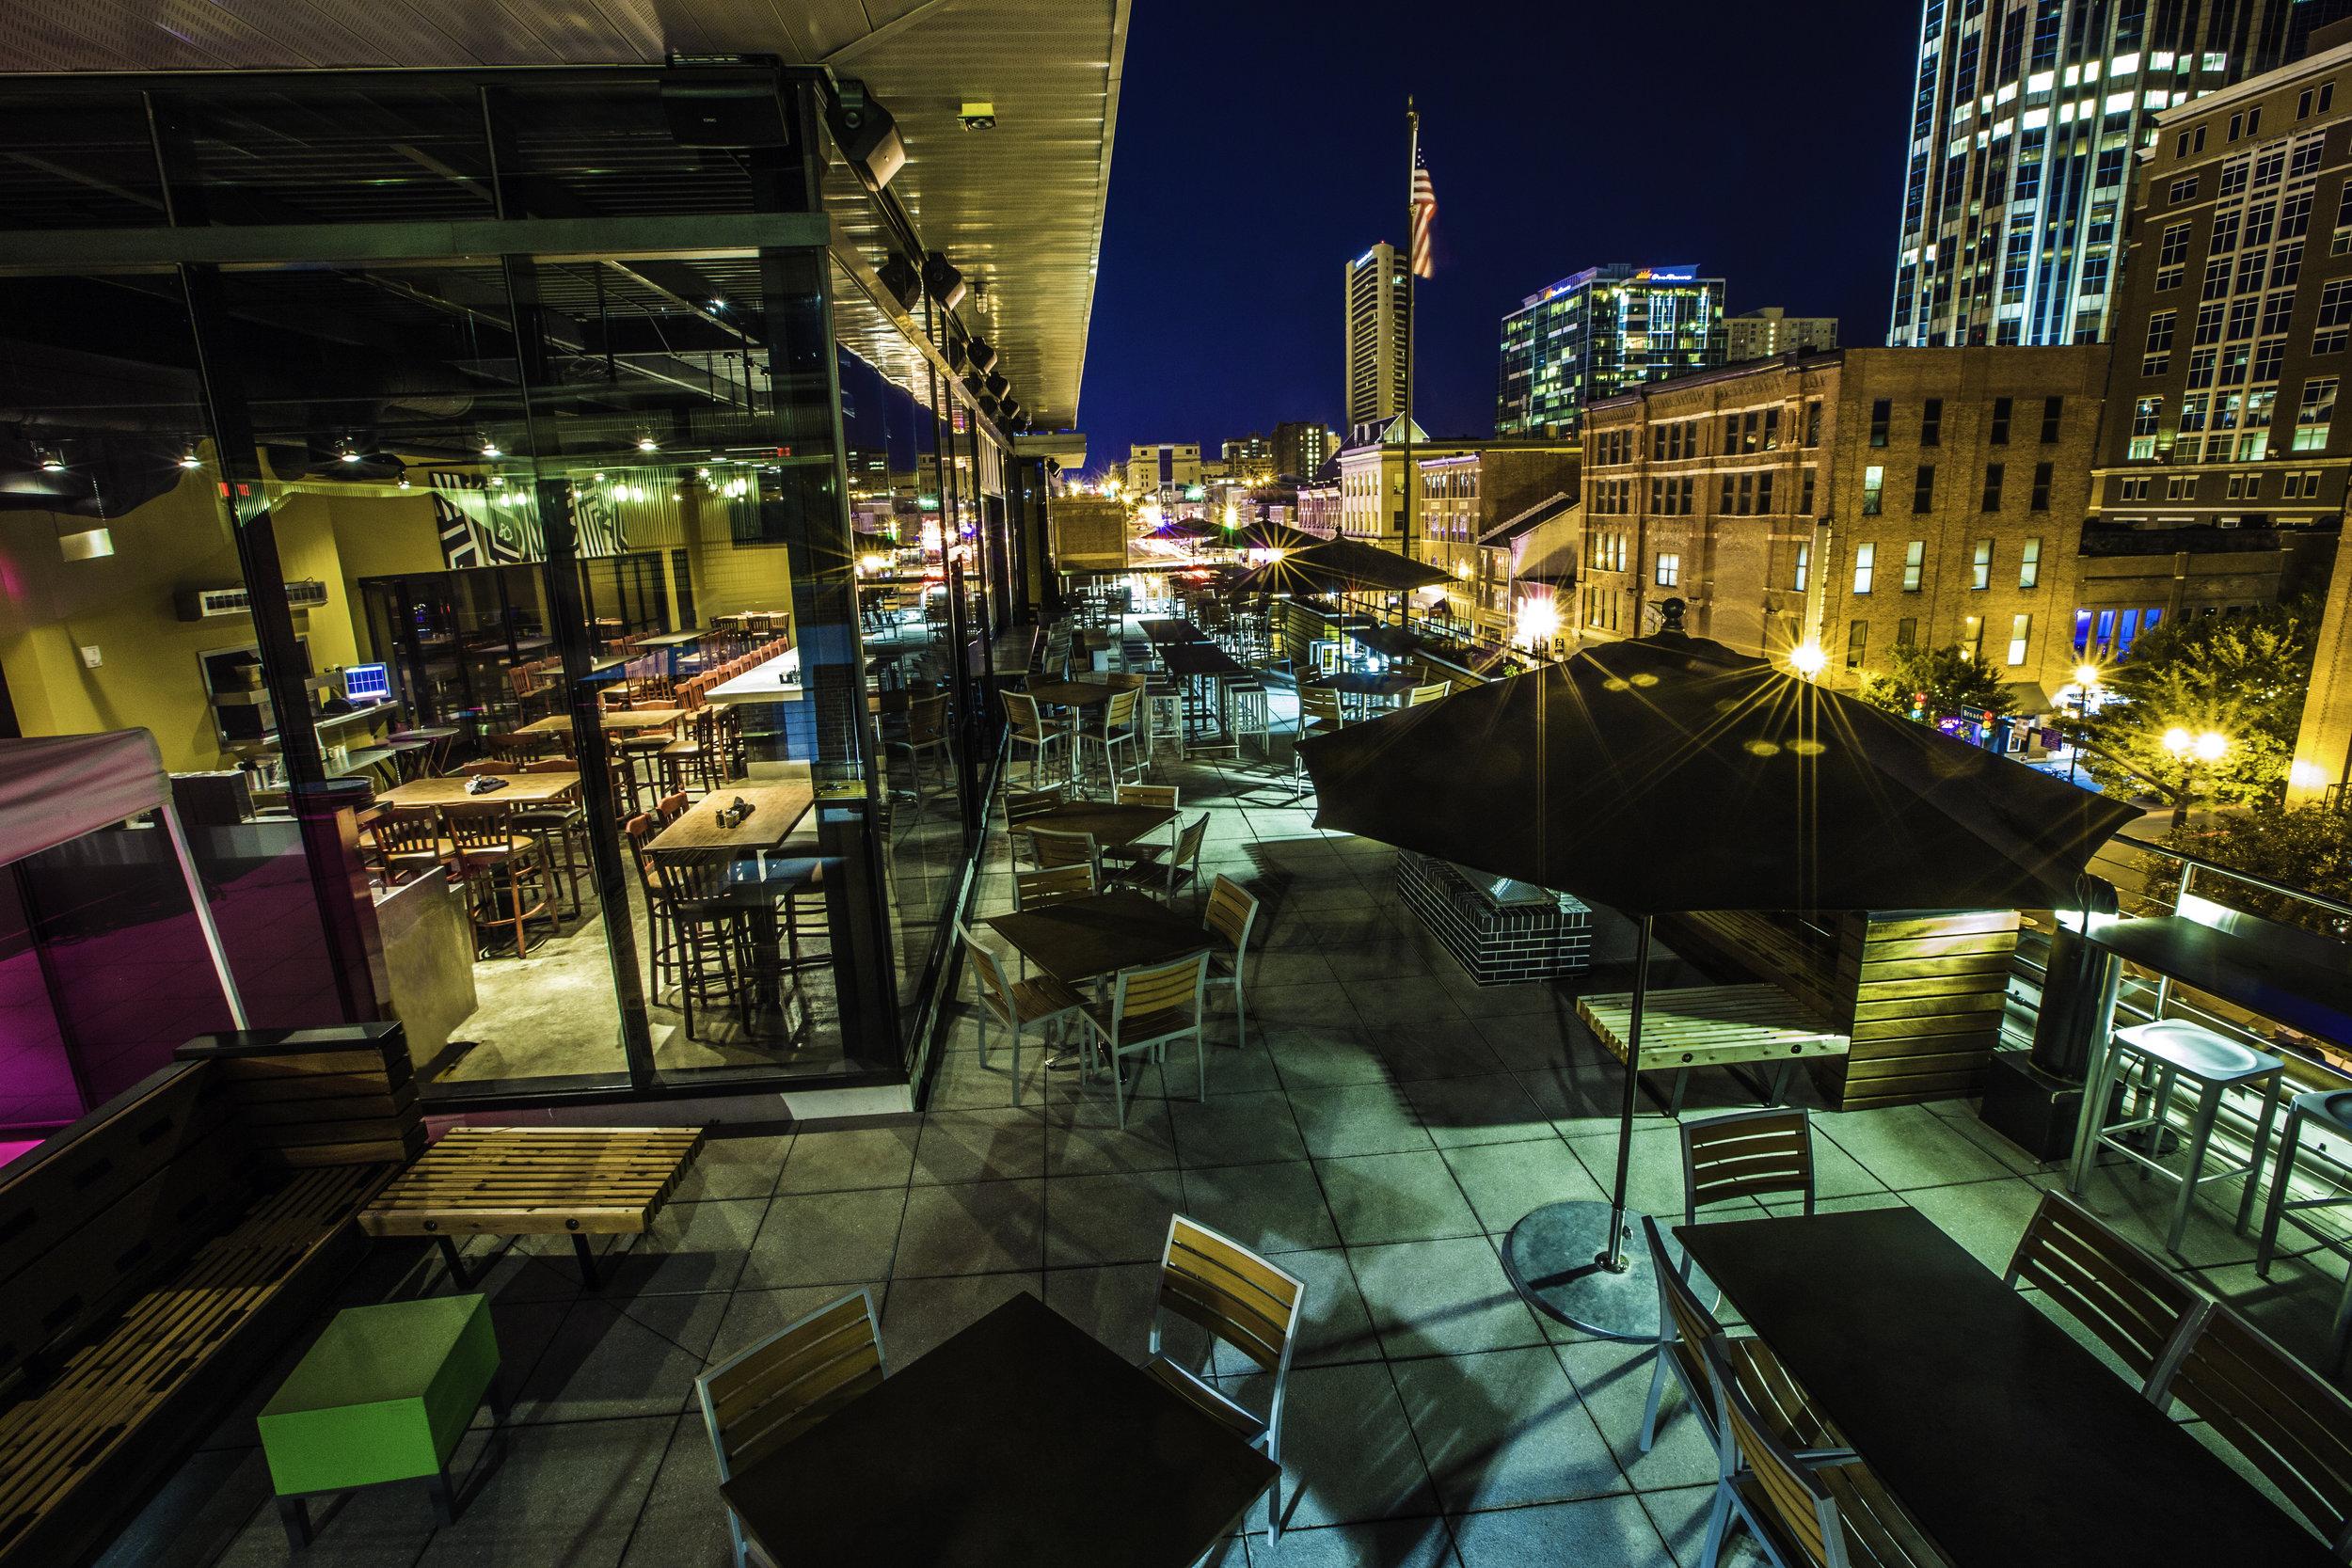 Nashville Rooftop - Rock Bottom Restaurant & Brewery